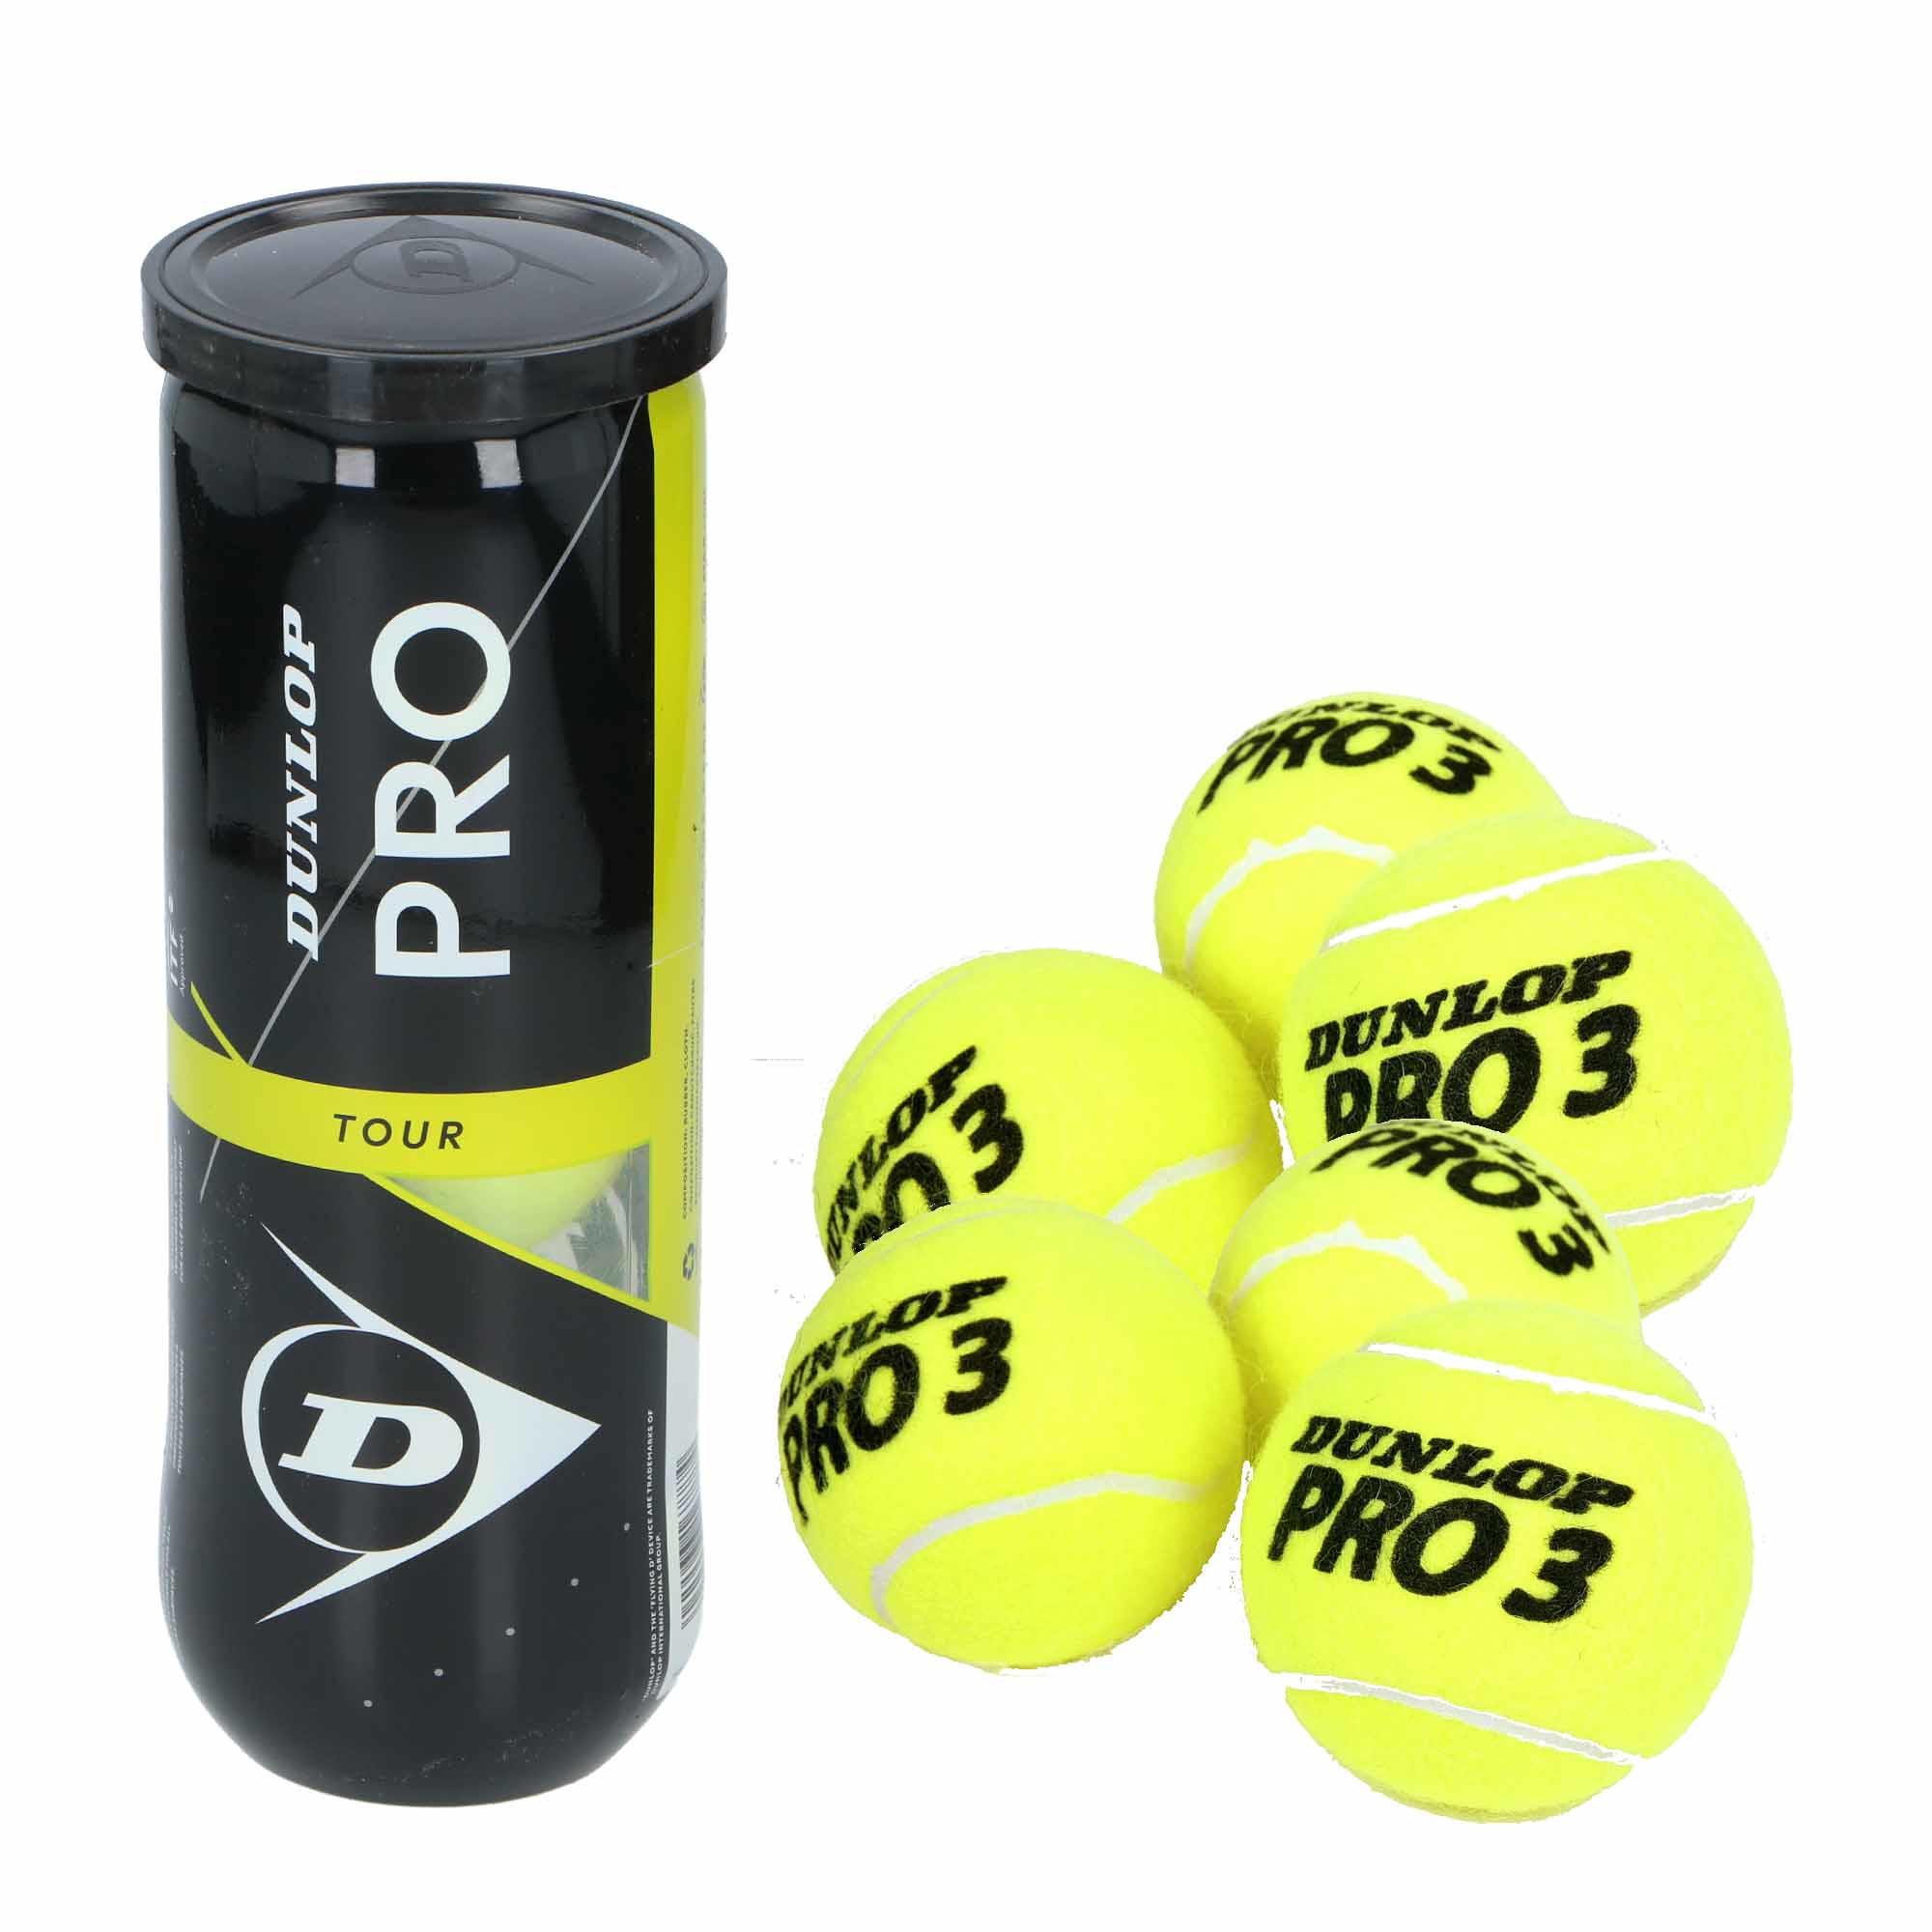 15x Professionele Dunlop Pro-tour tennisballen in koker